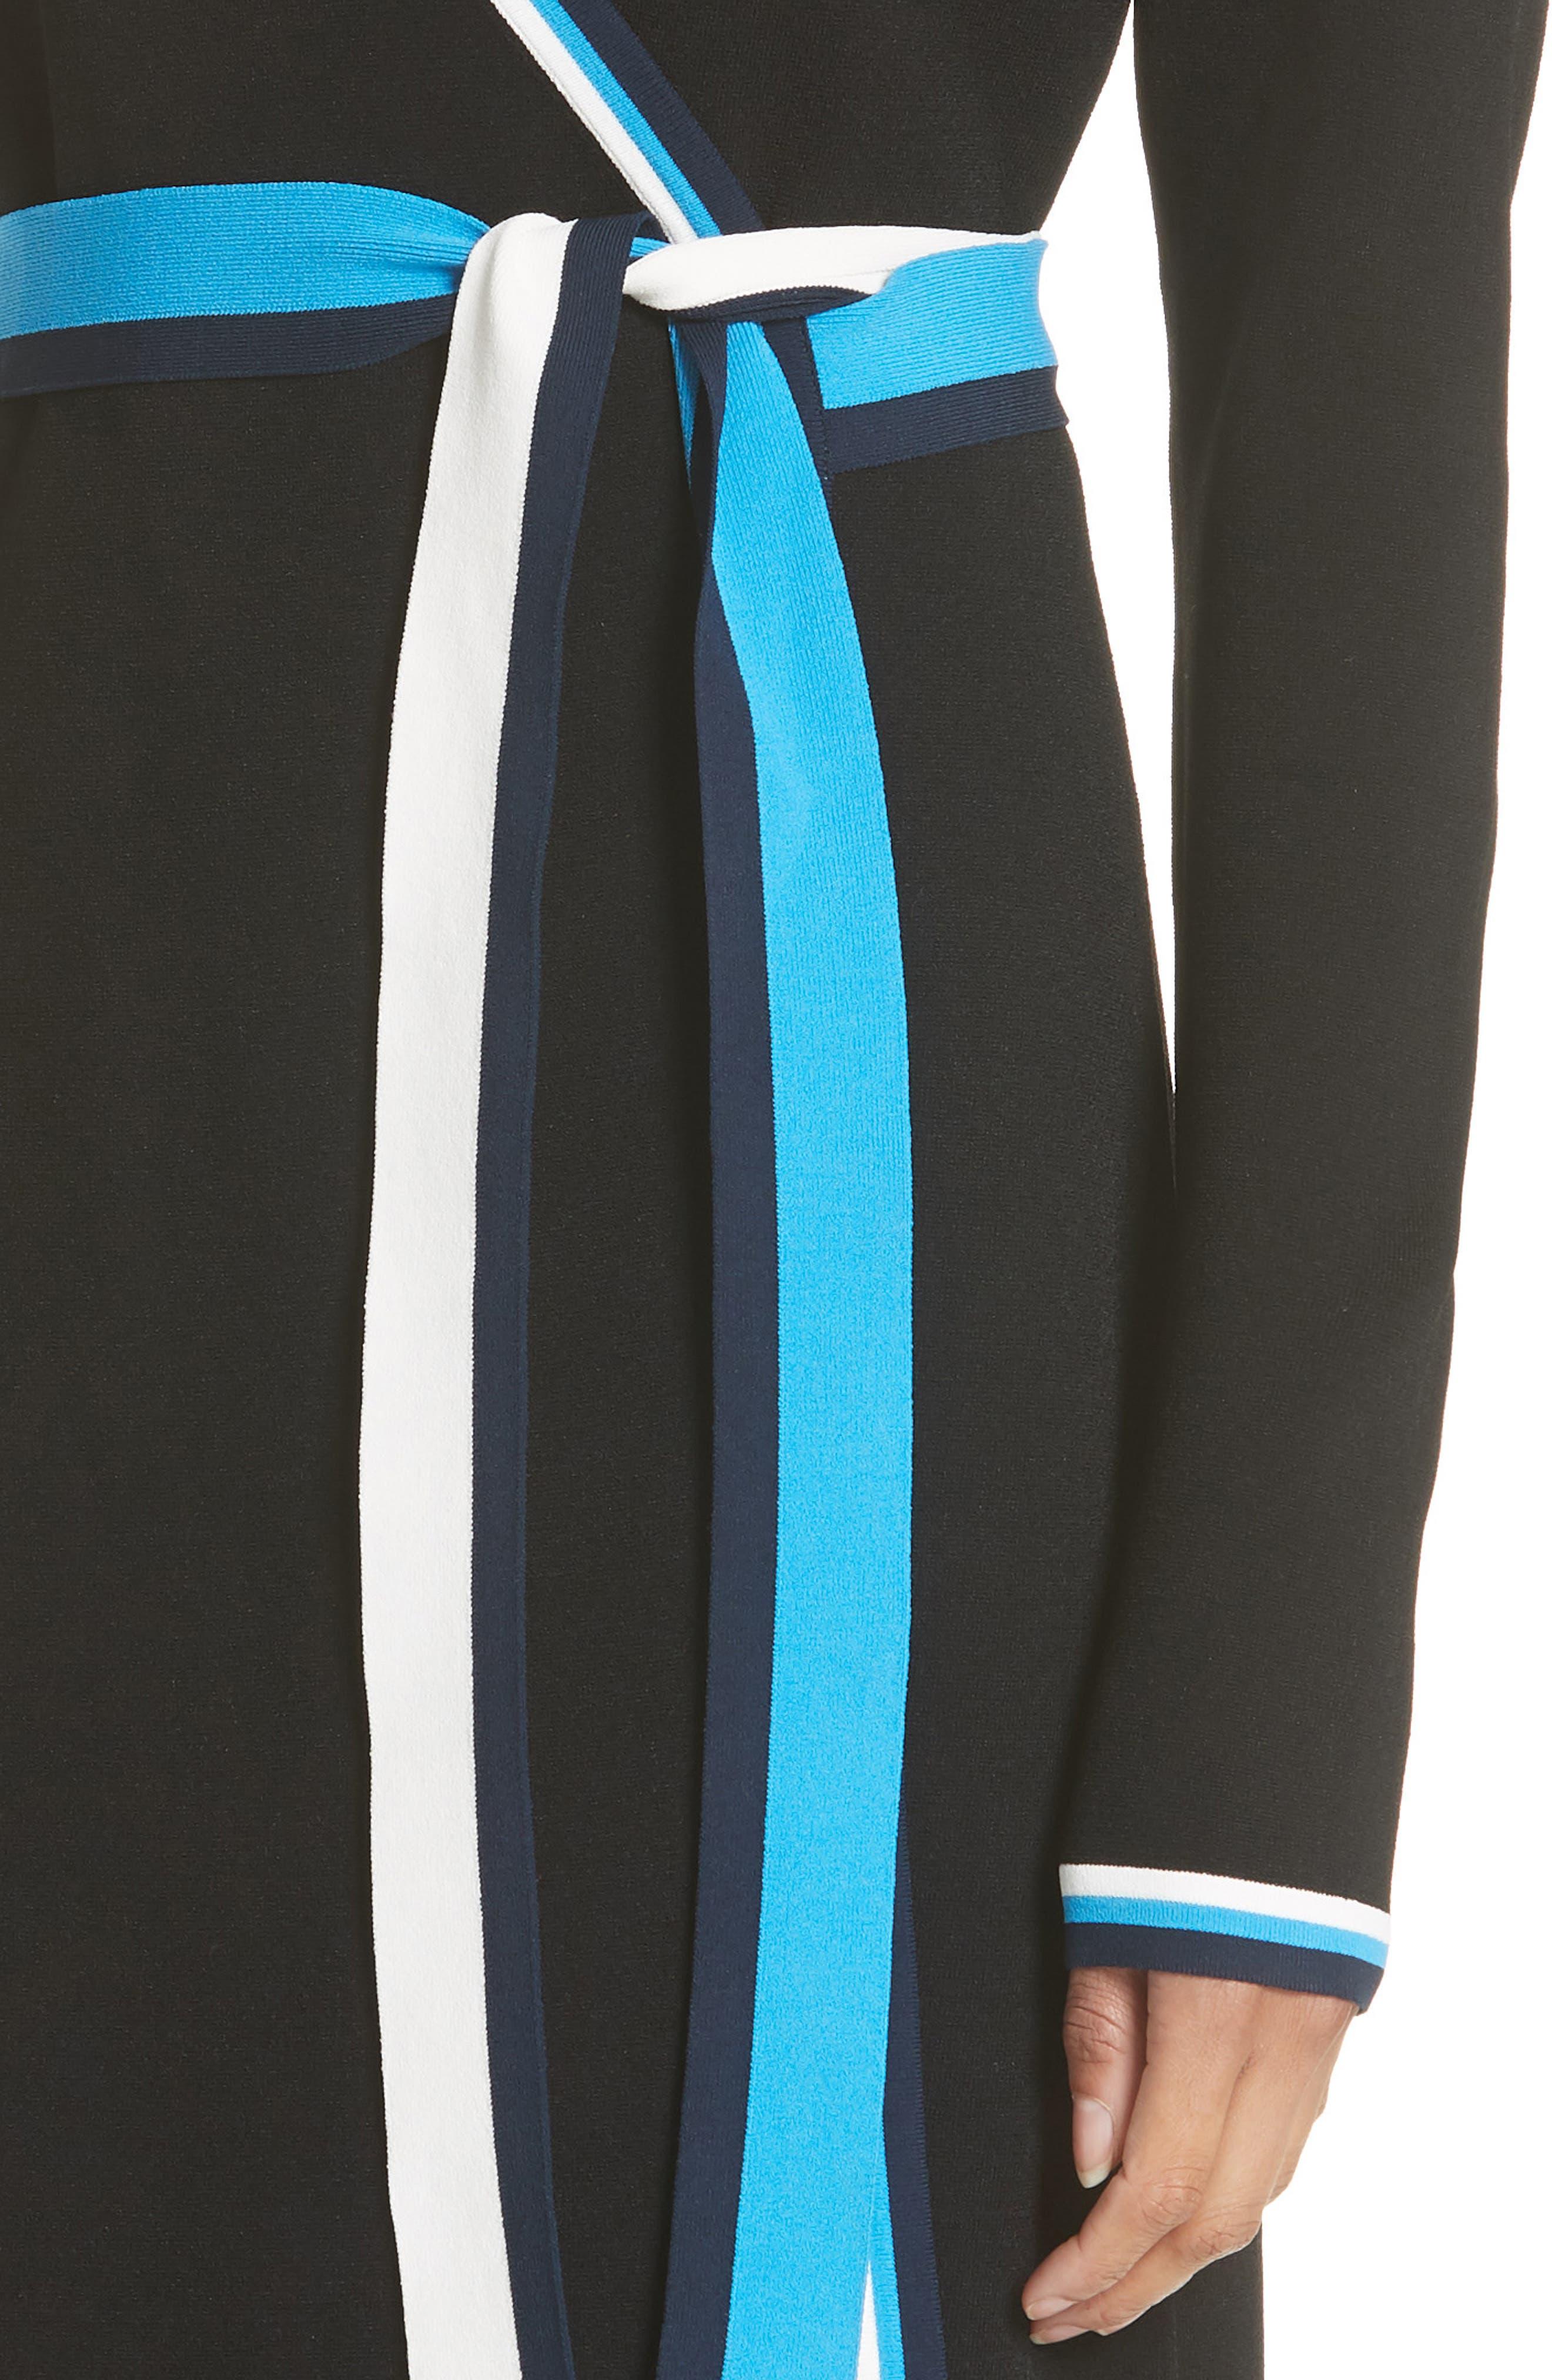 Diane von Furstenberg Wrap Sweater Dress,                             Alternate thumbnail 4, color,                             006